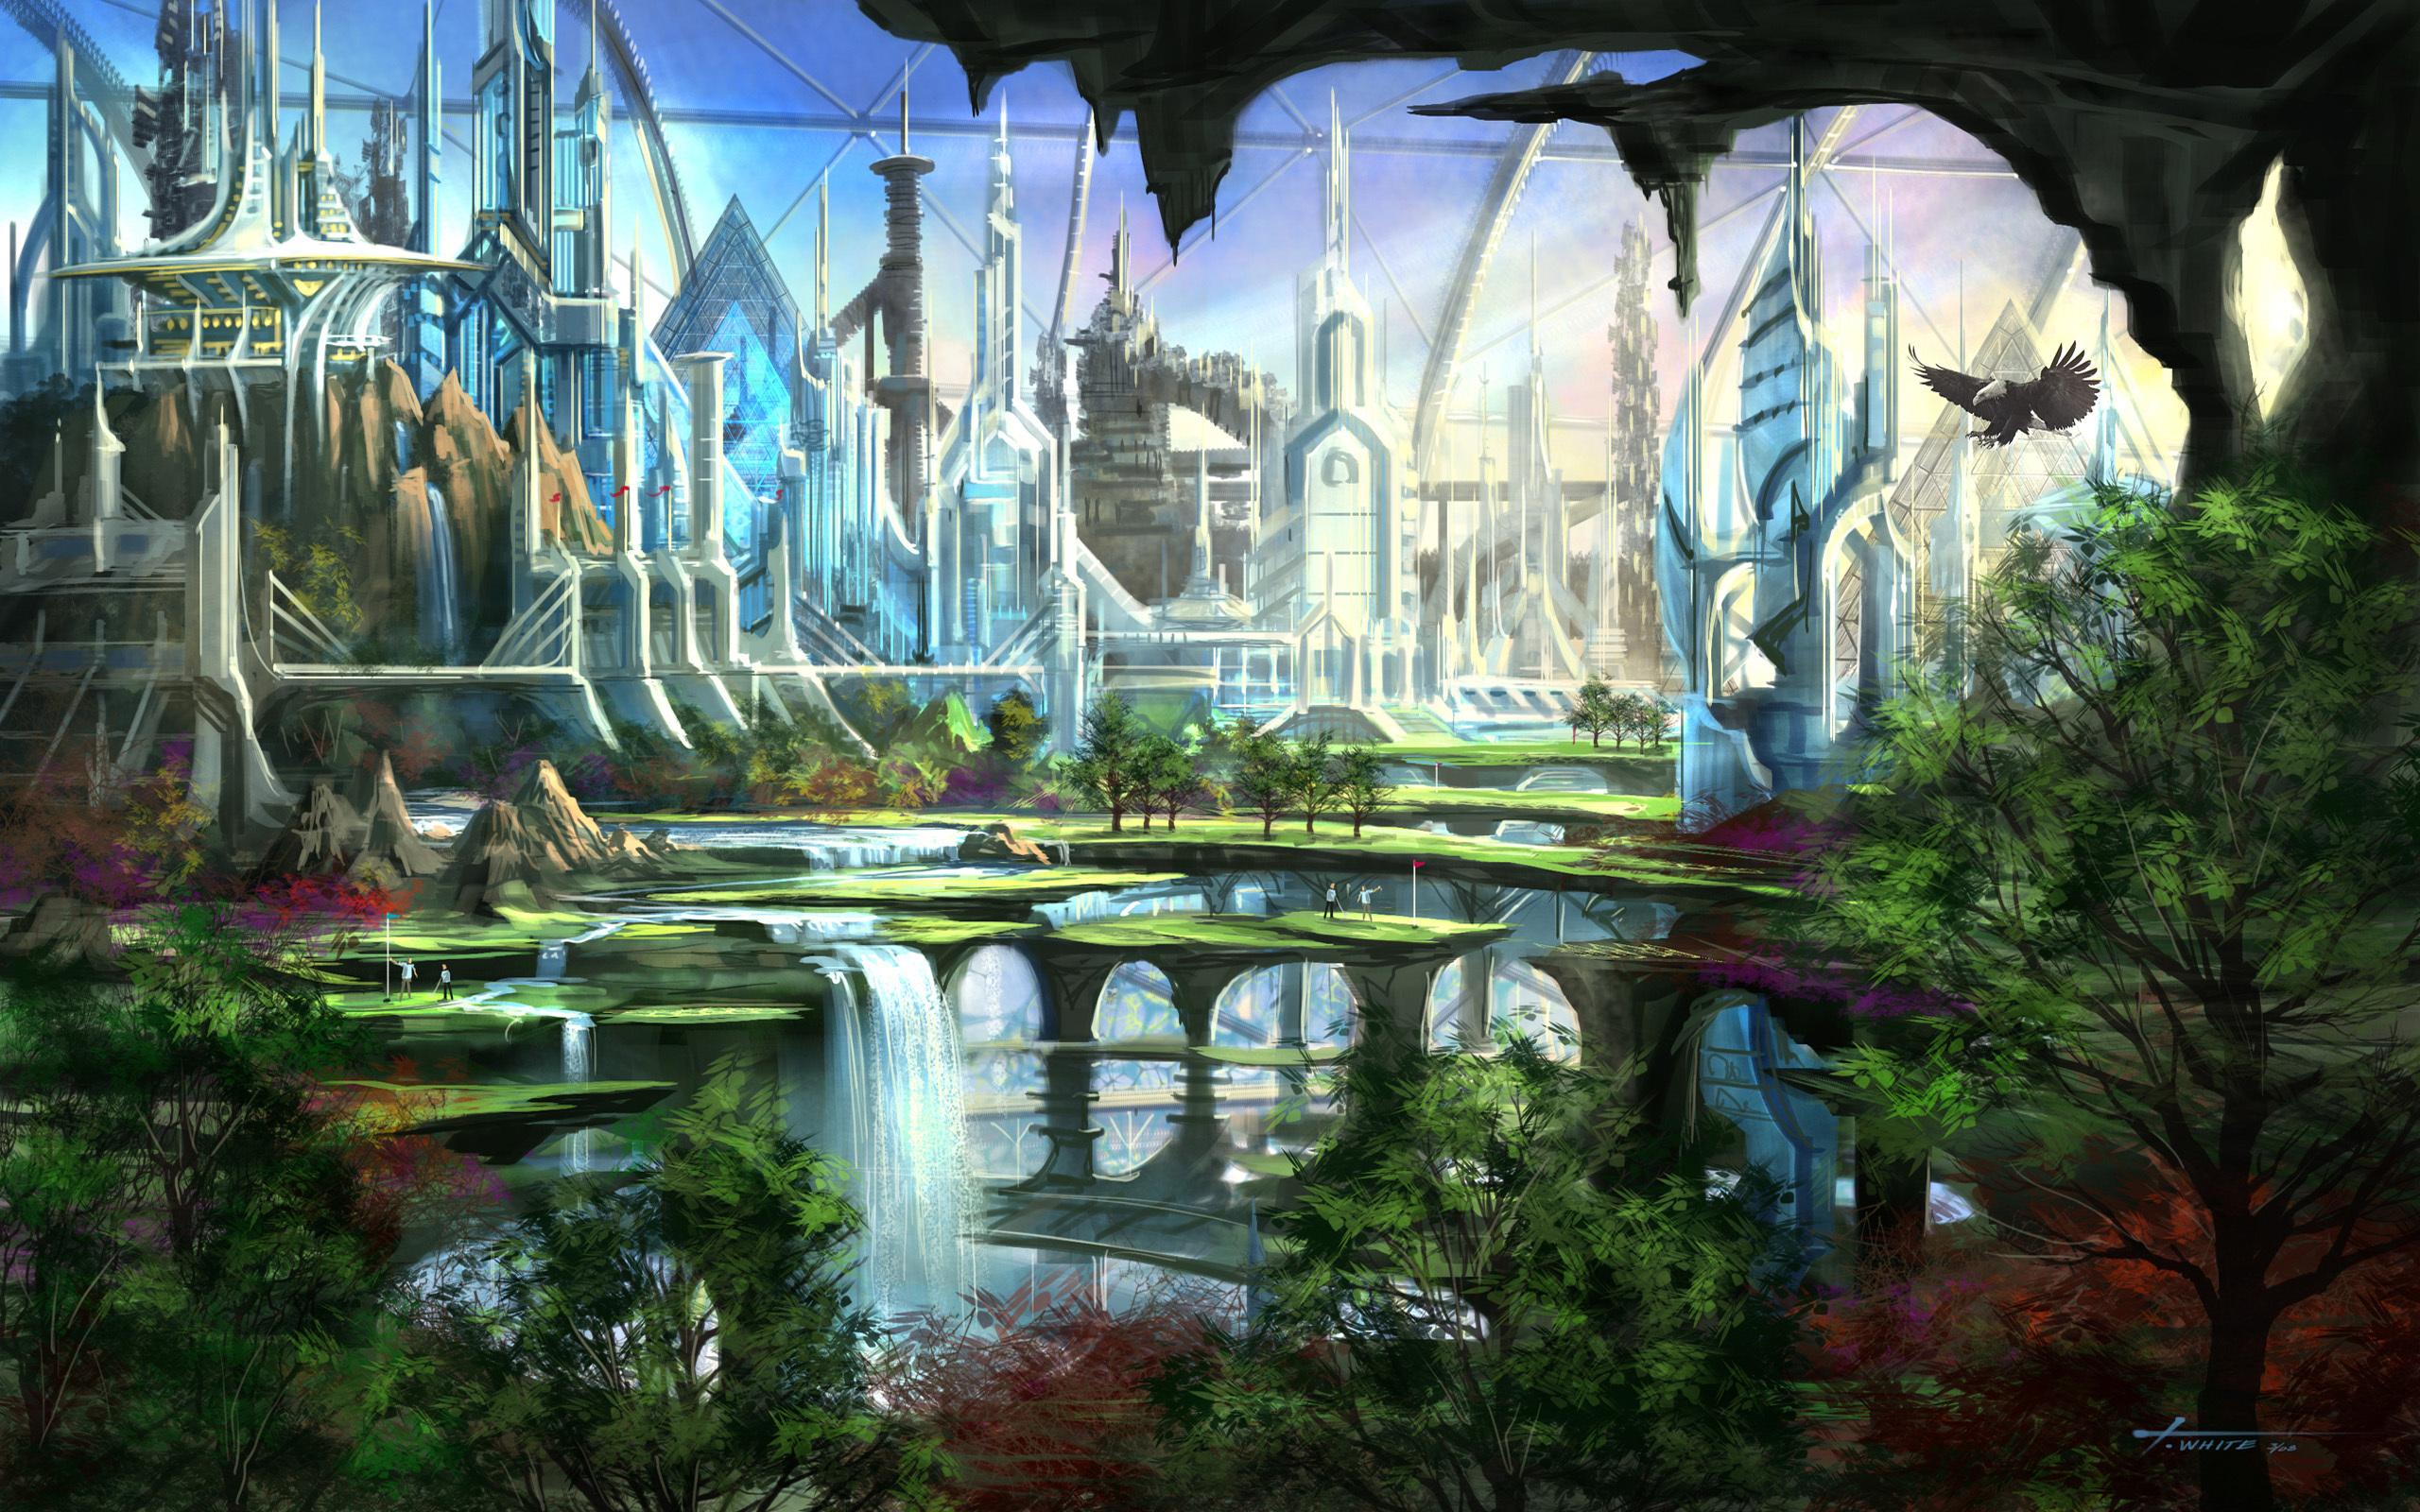 Fantasy_Landscape_fantastic_city_056774_